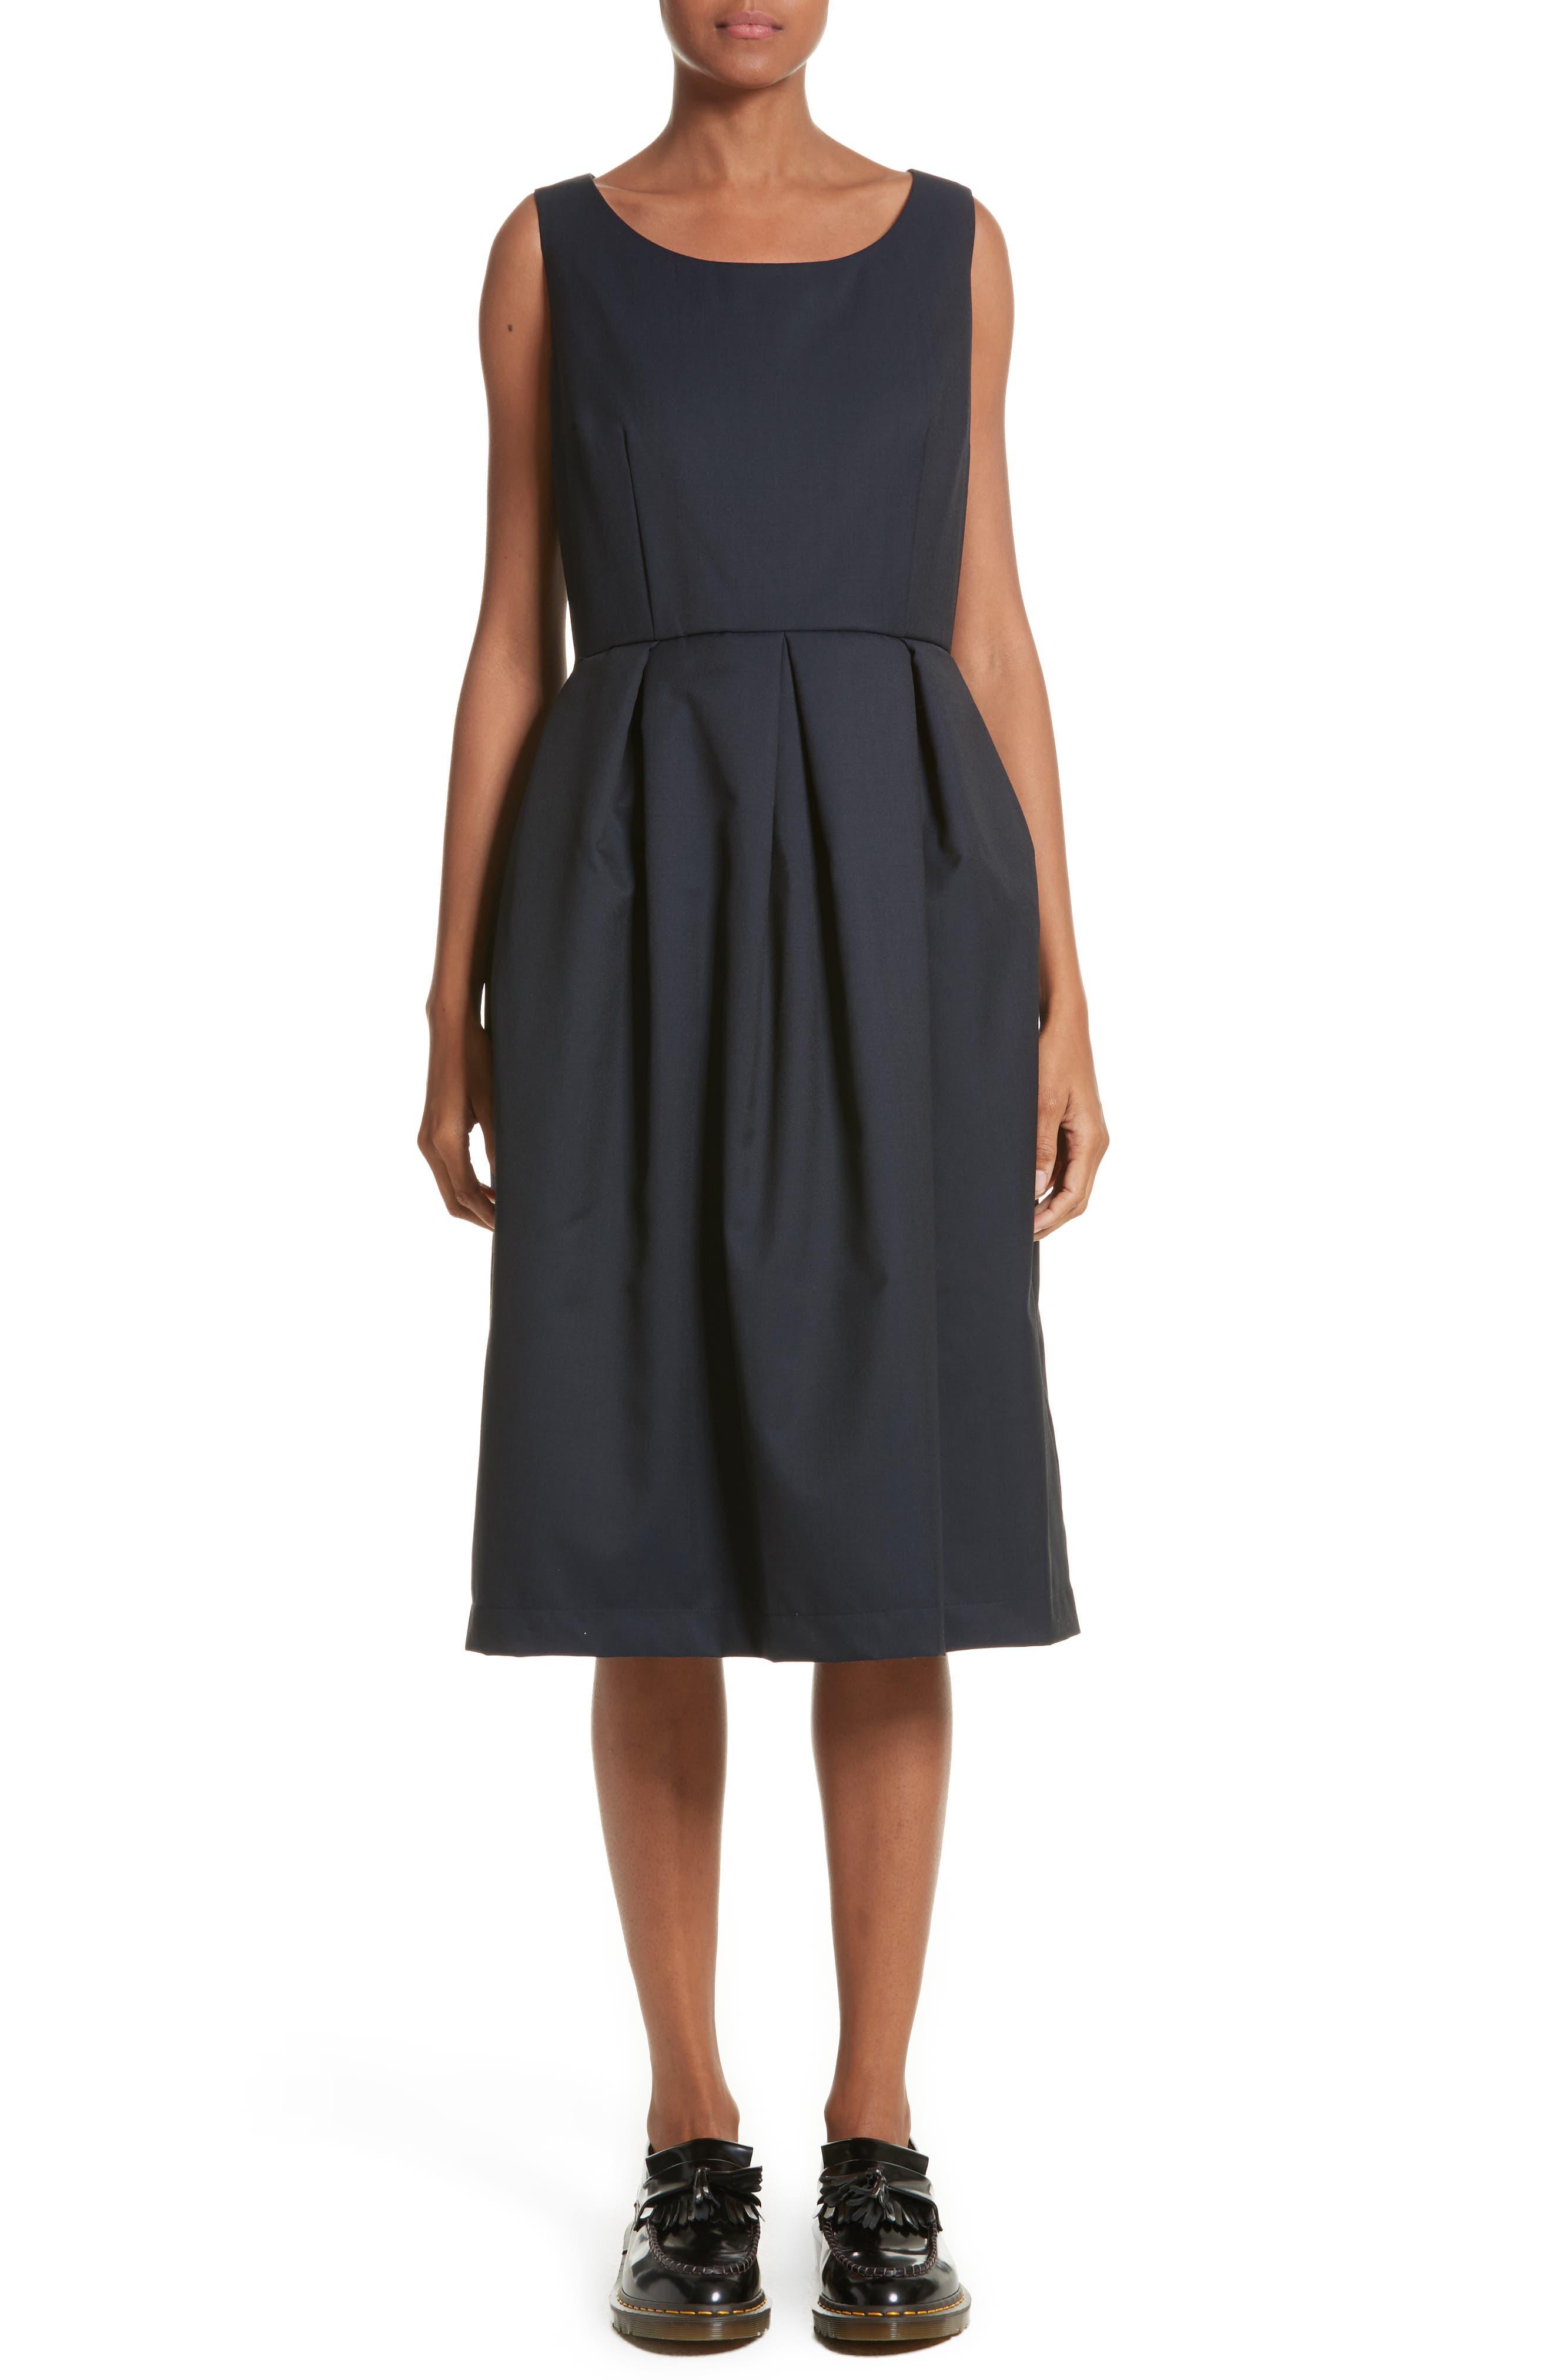 Alternate Image 1 Selected - Comme de Garçons Sleeveless Fit & Flare Dress